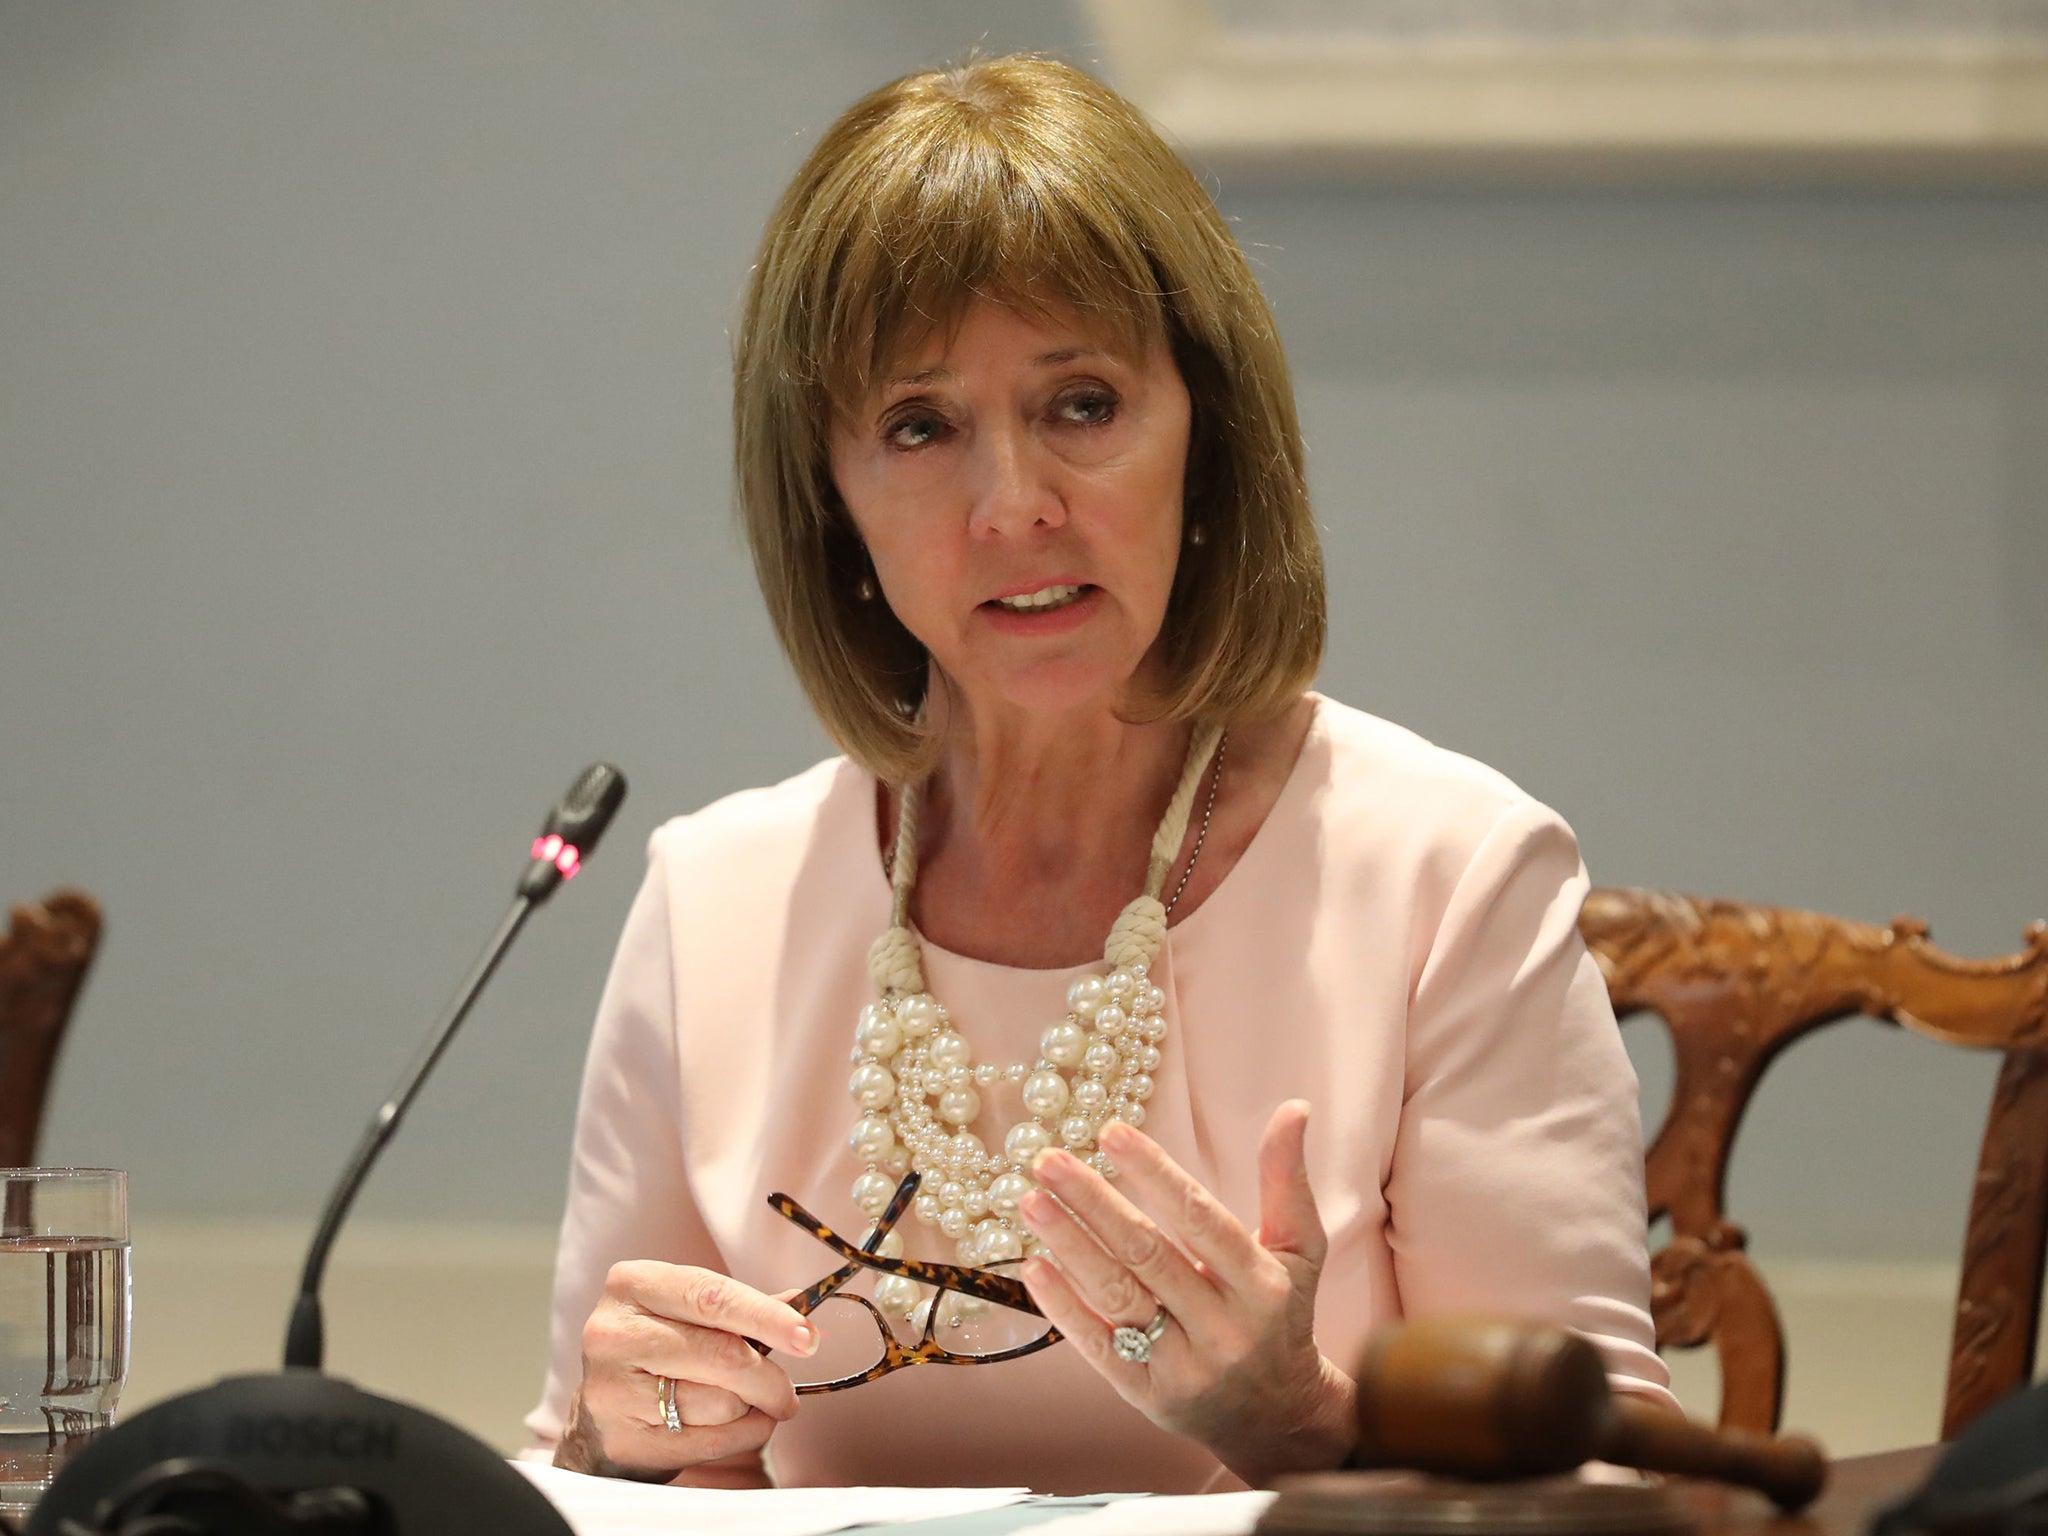 Joan Freeman: The senator and psychologist running in the Irish presidential election